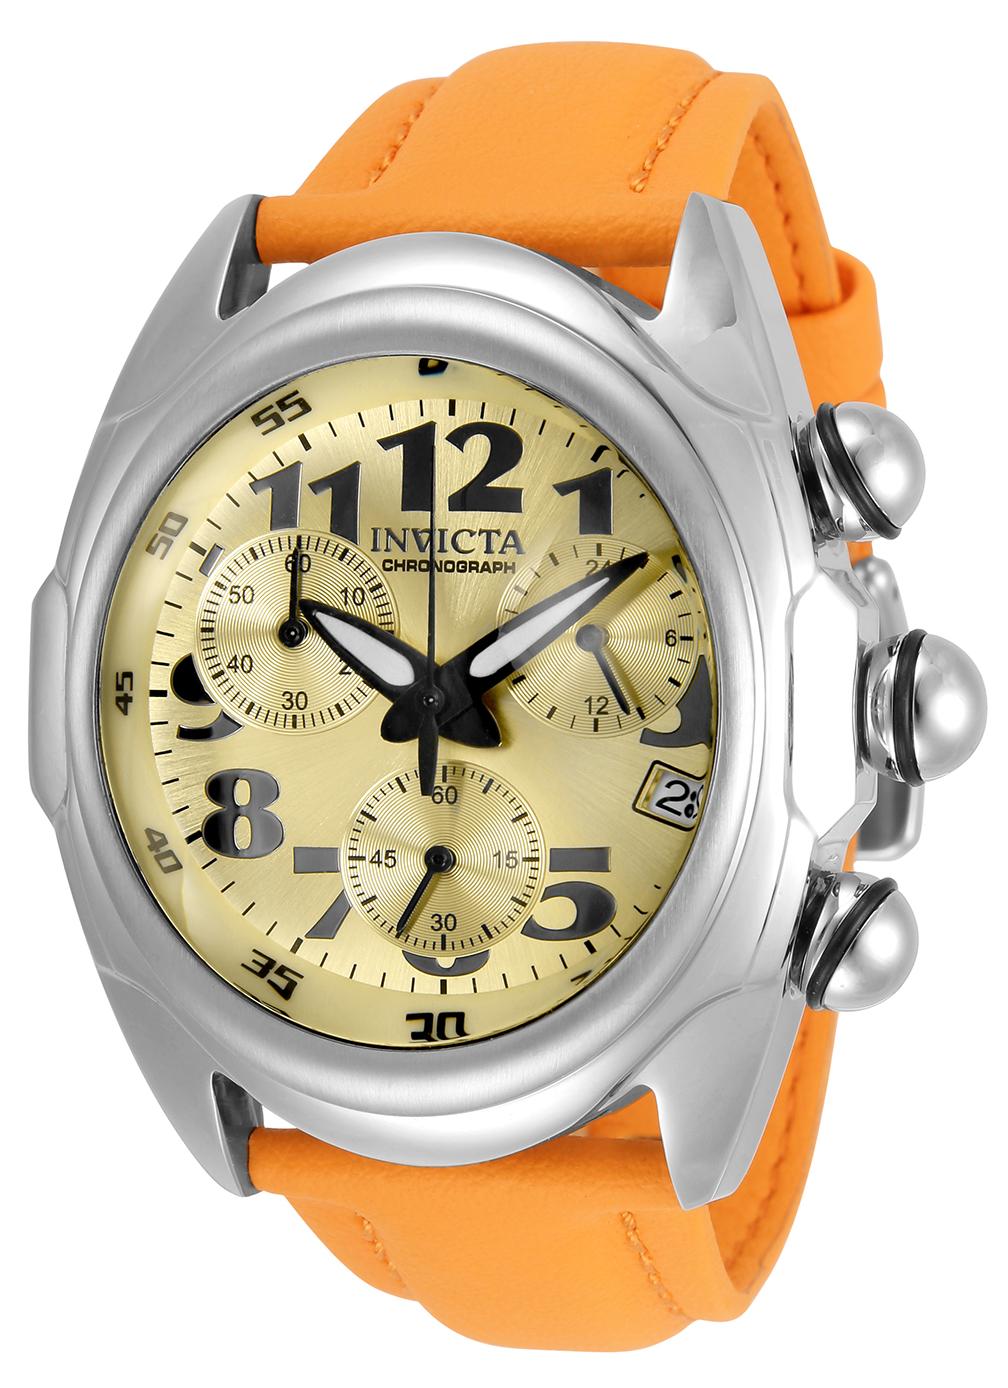 Invicta Lupah Quartz Mens Watch - 46mm Stainless Steel Case, Polyurethane Band, Orange (31403)